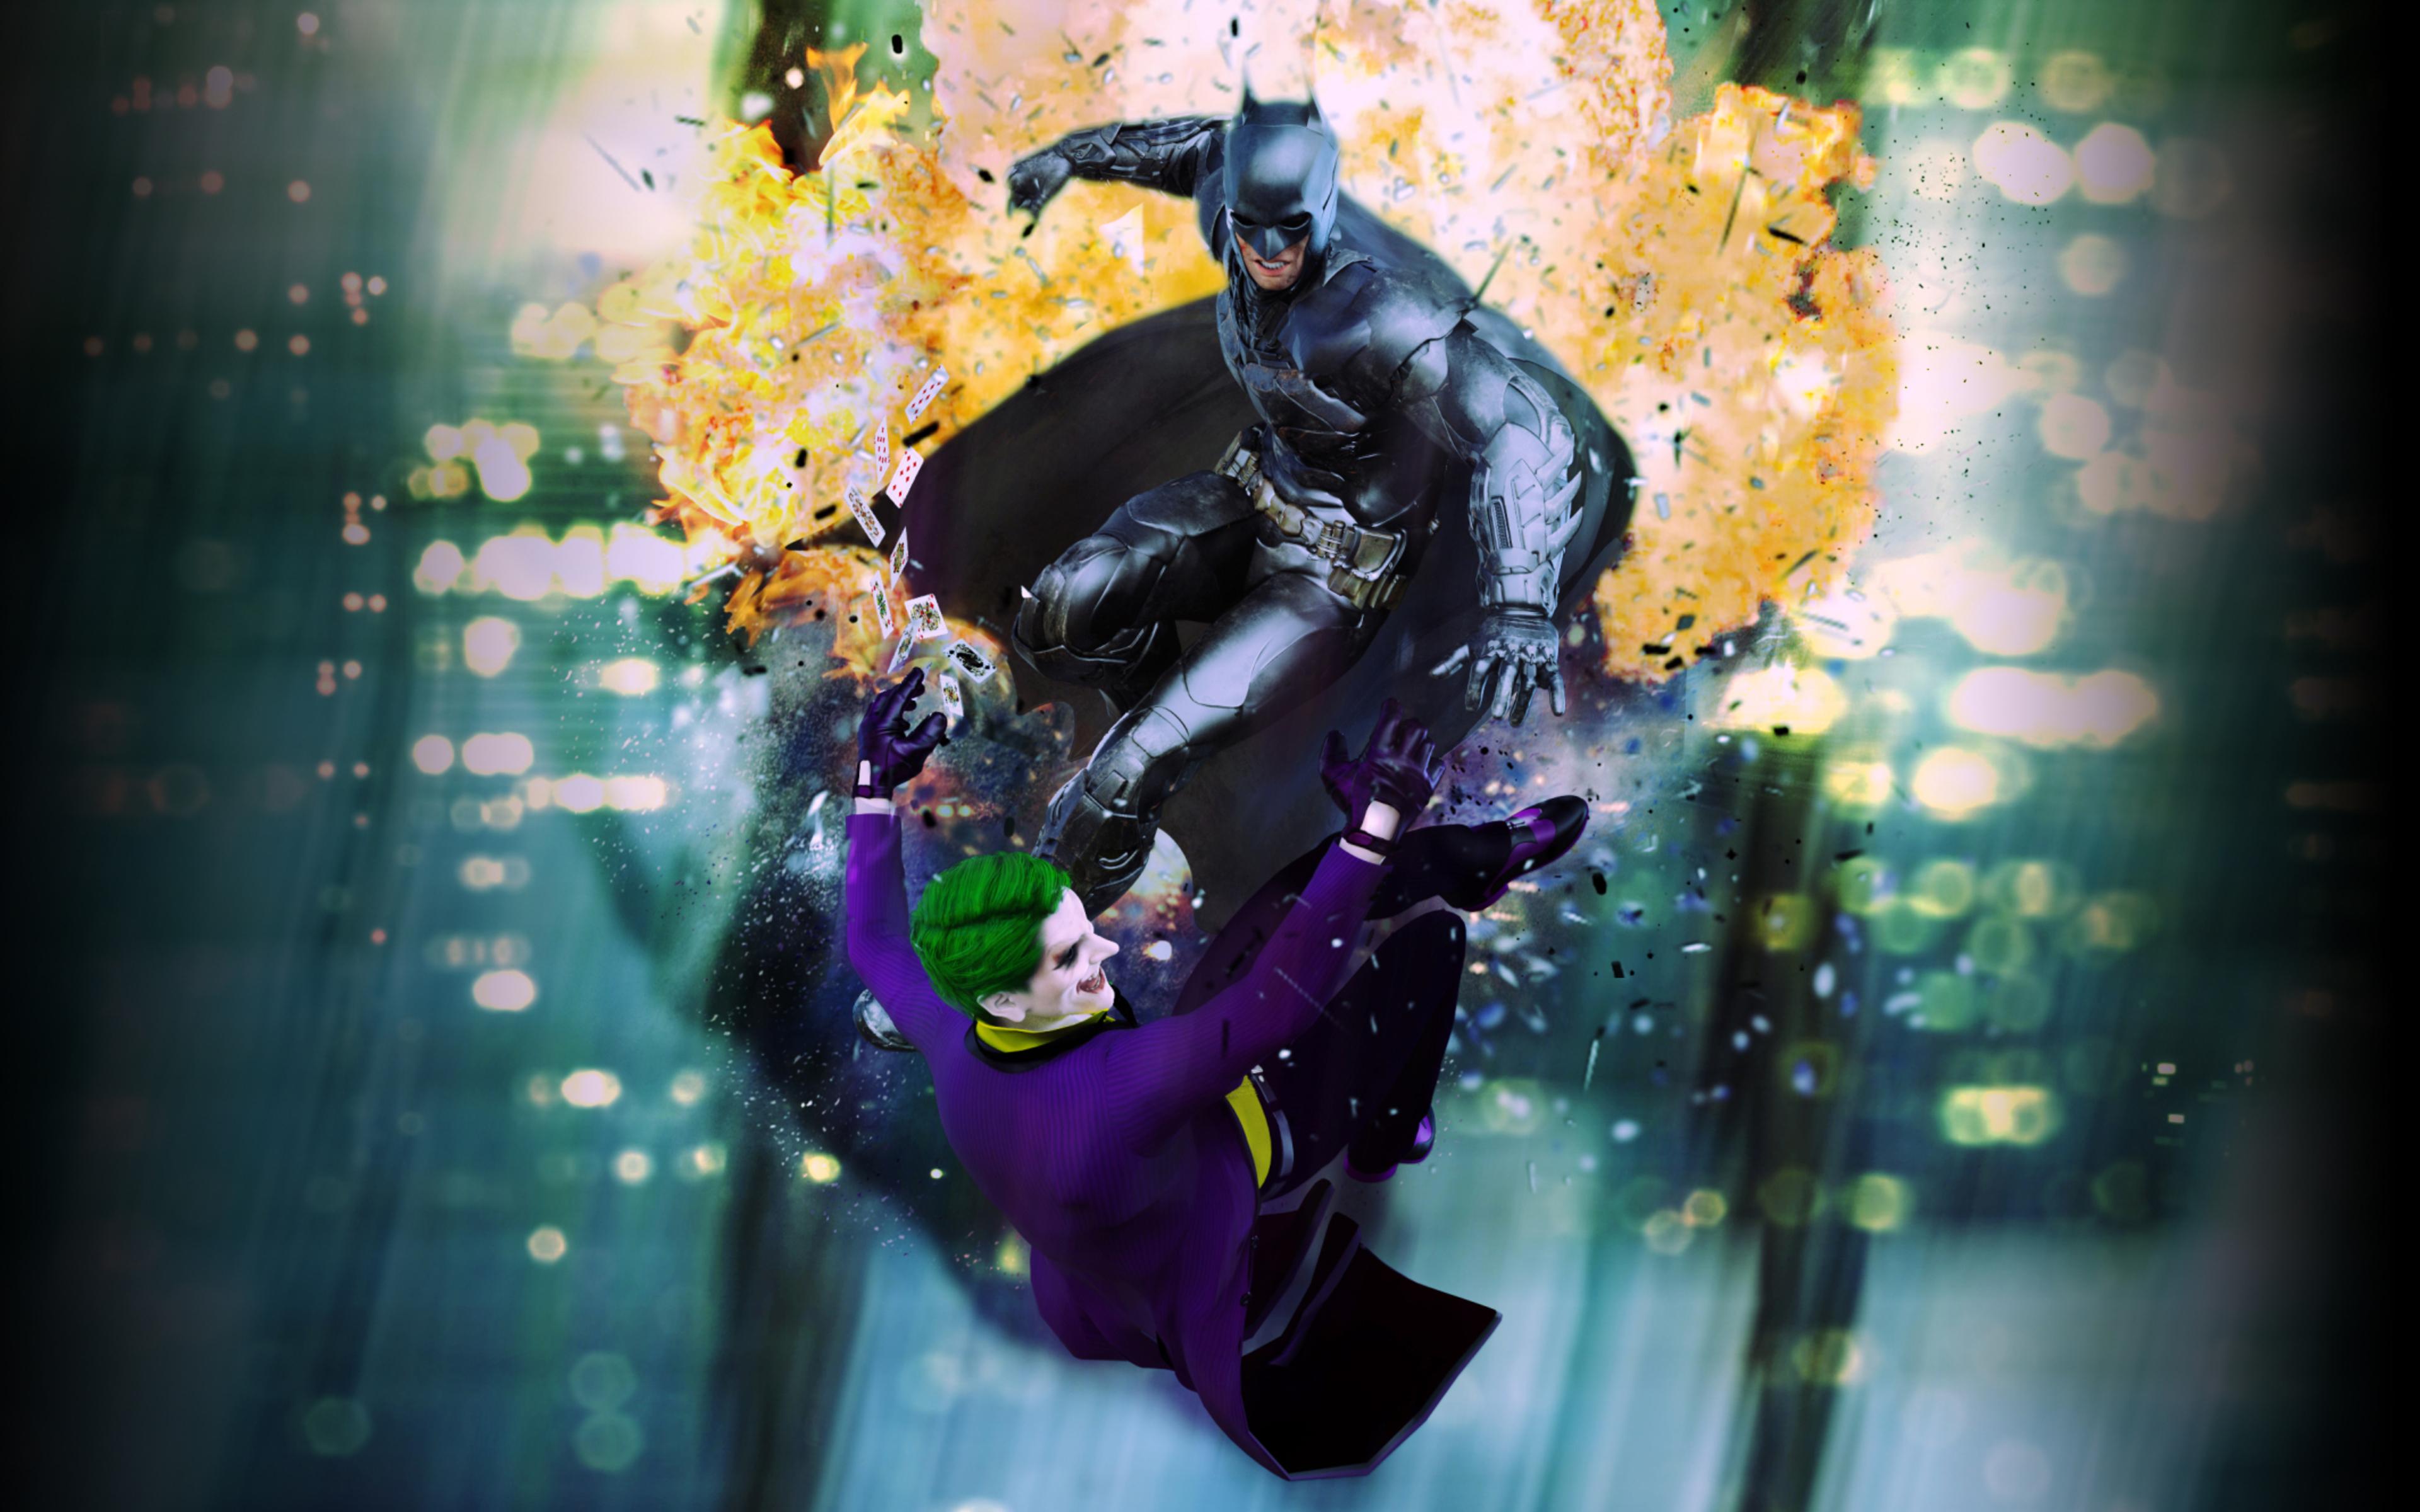 3840x2400 Joker Vs Batman 4k HD 4k Wallpapers, Images ...